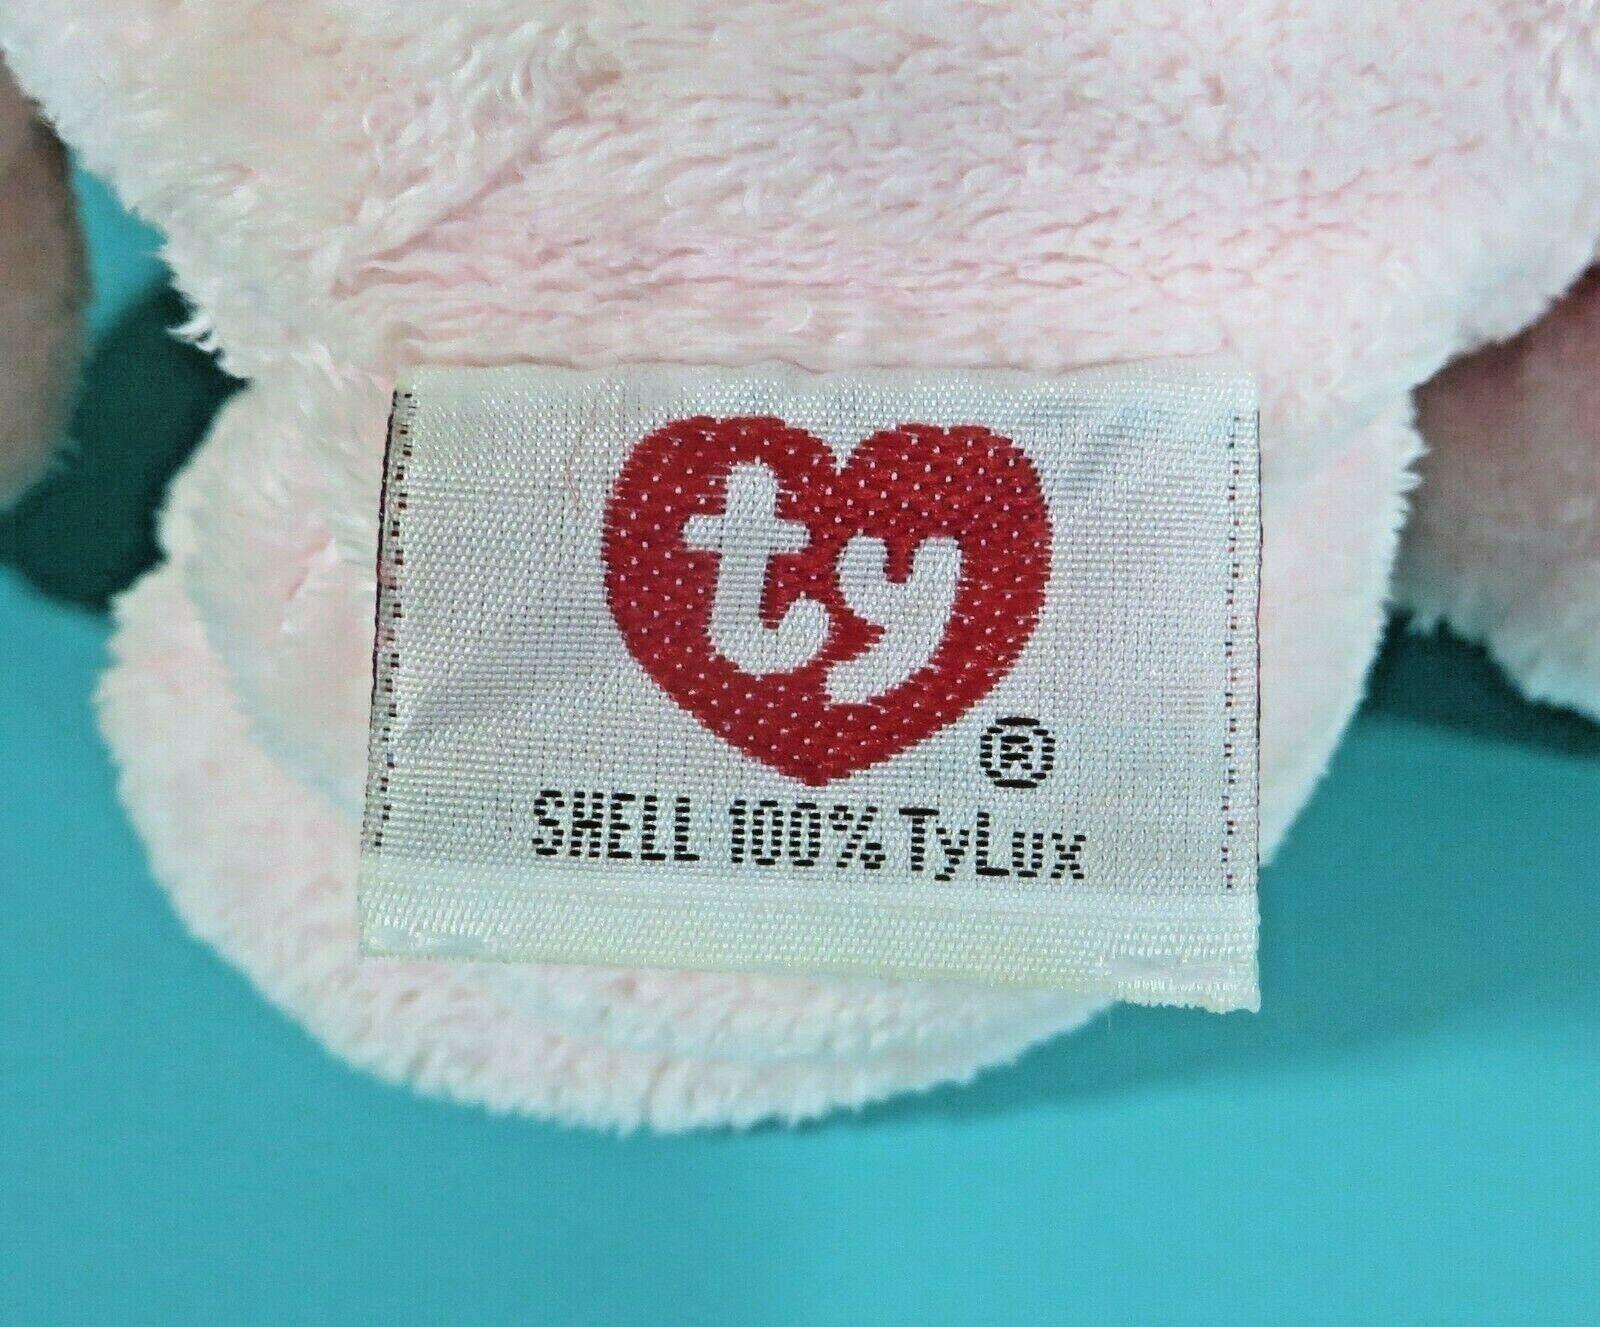 "Ty Pluffies Pinks Teddy Bear 9"" Plush Pink Peach Stuffed Animal Baby Lovey 2002 image 5"